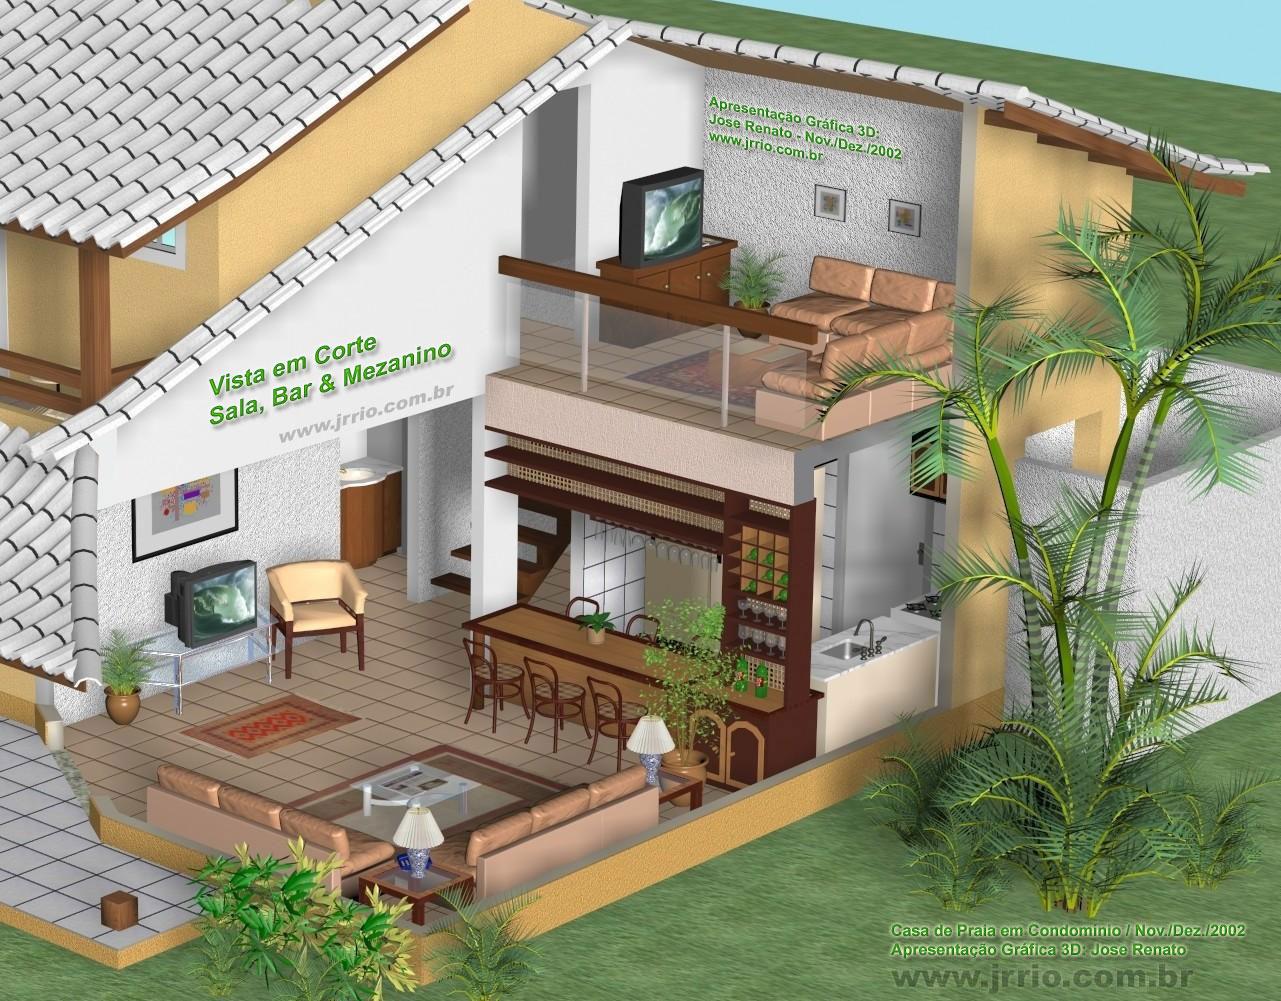 Corte 3d de arquitetura onde aparece ampliada a sala mezanino e bar #288DA3 1281 1001